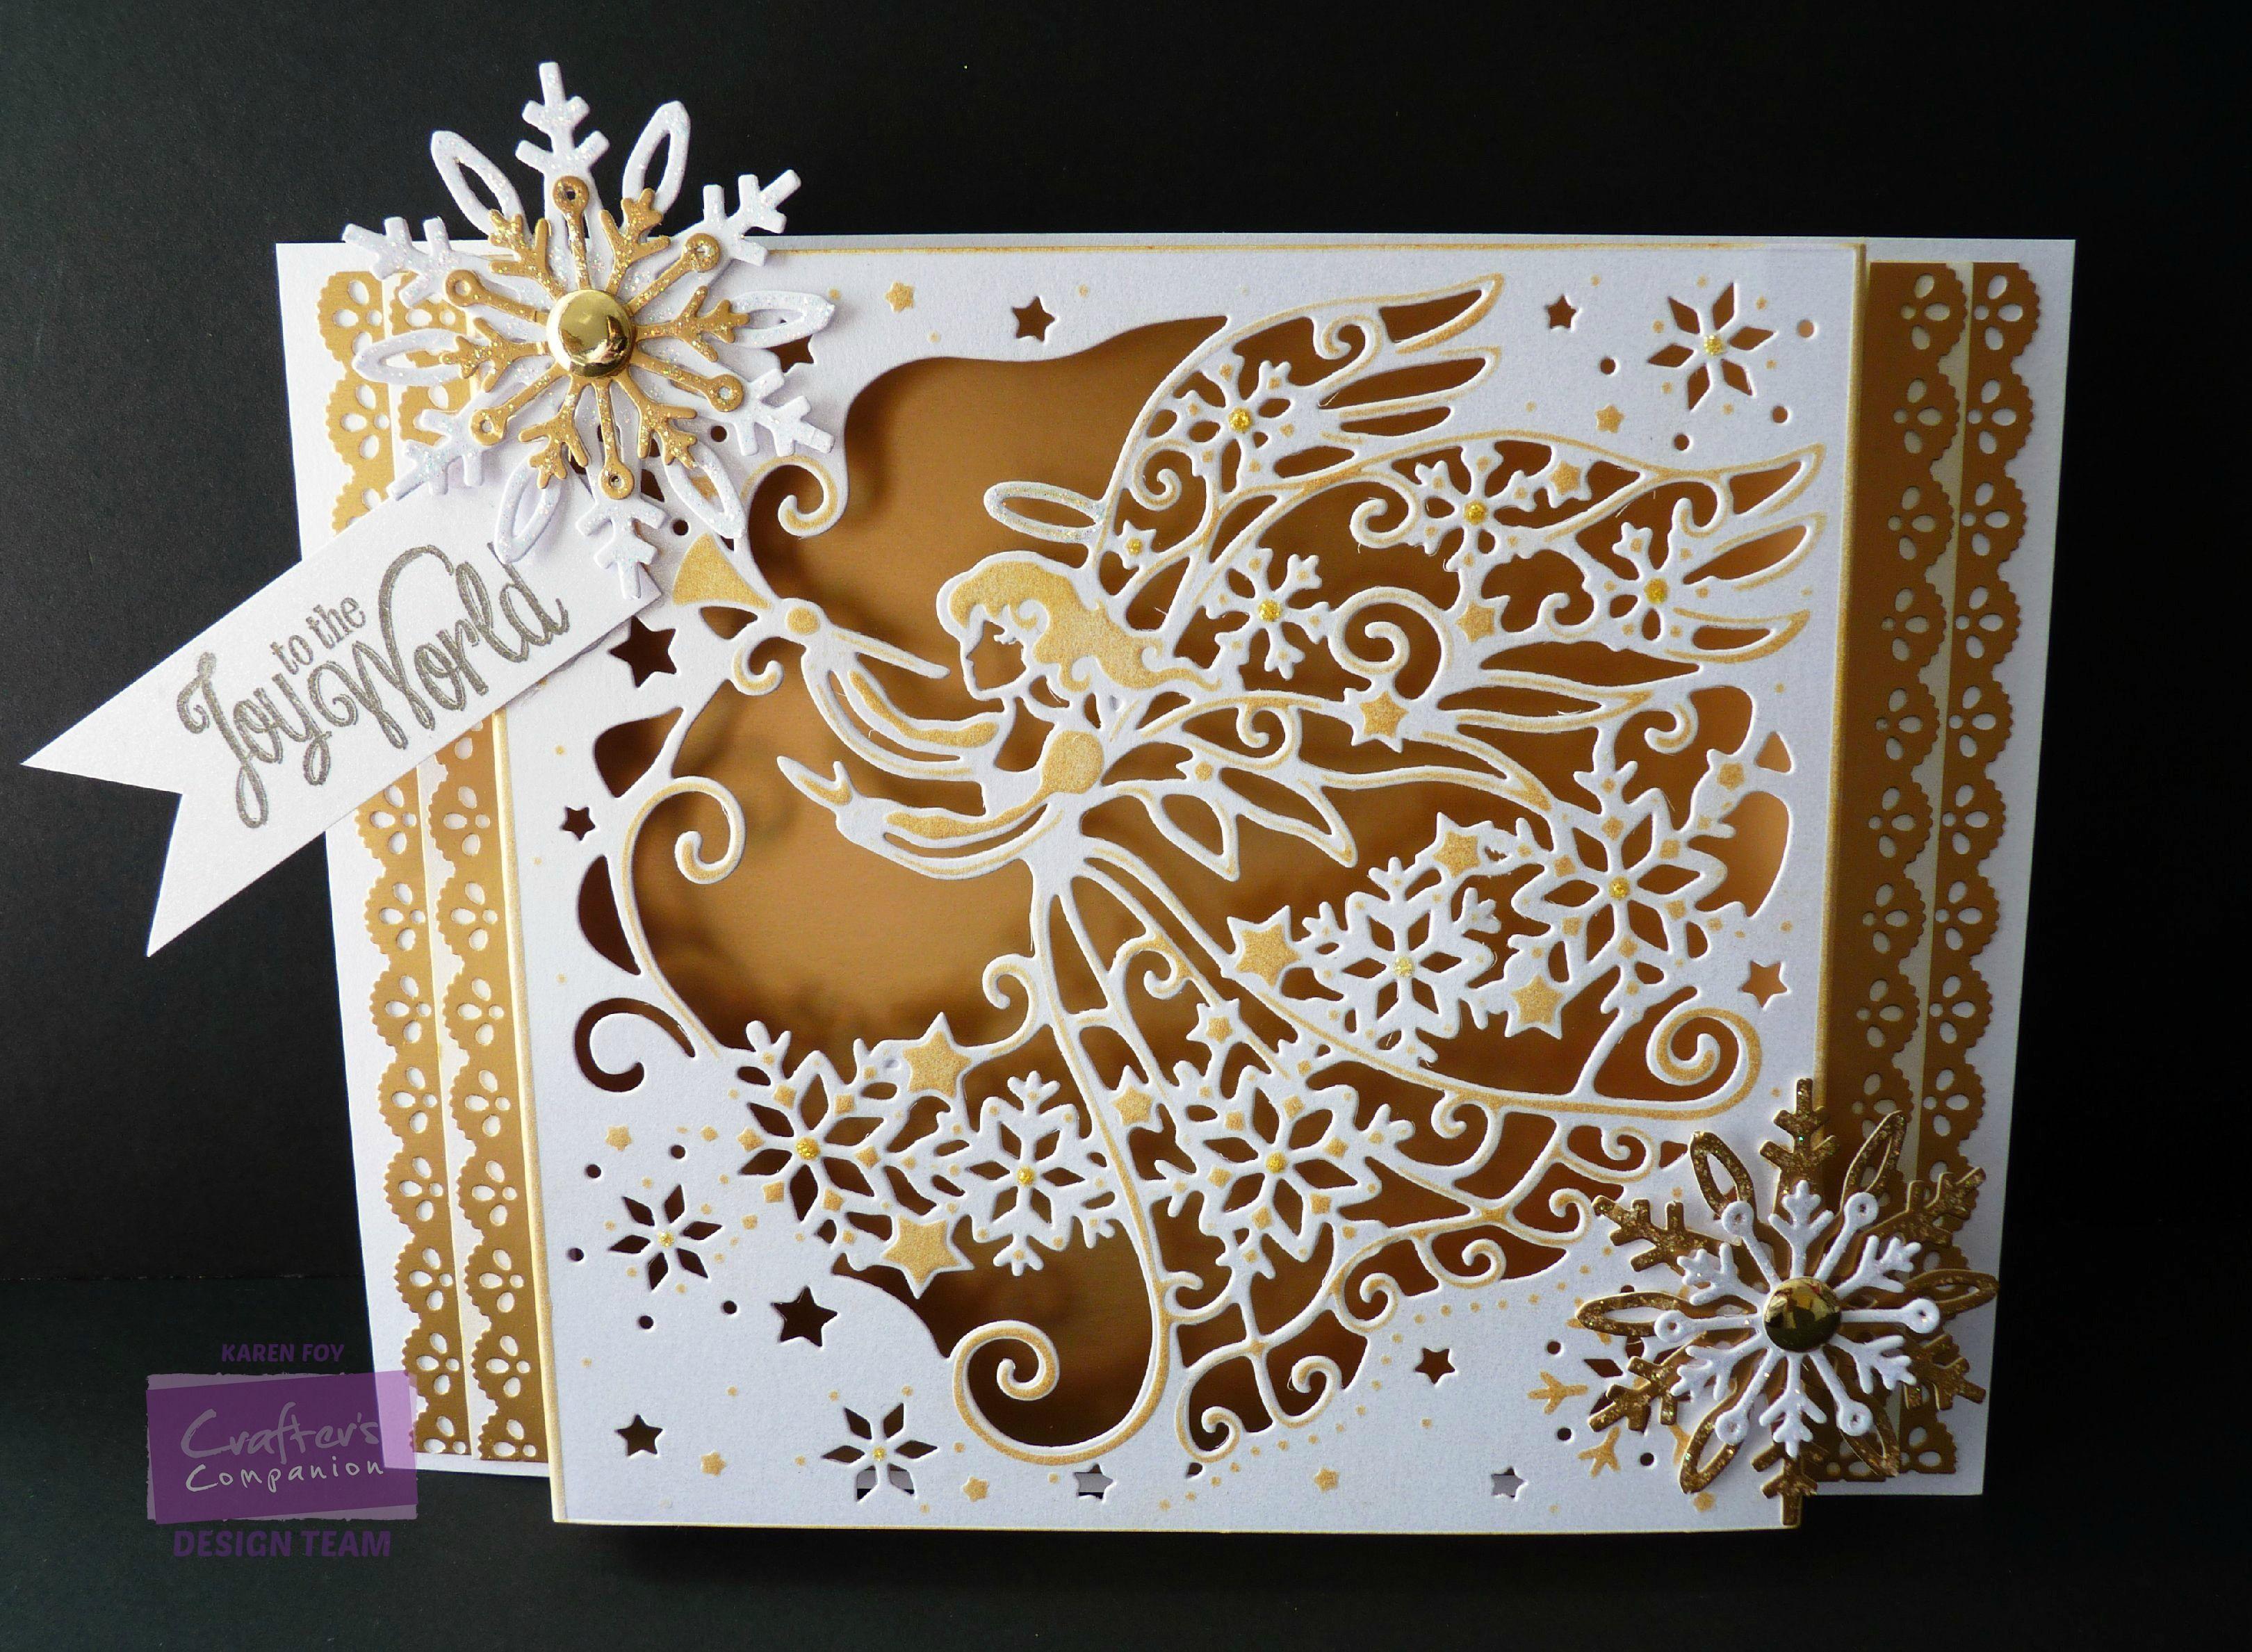 Karen Foy -  Angel Create-a- Card Die - Centura Pearl Card Gold card, Die'sire Snowflake Die, Distress Inks, Glitter, Gems, Sentiment - #crafterscompanion #Christmas